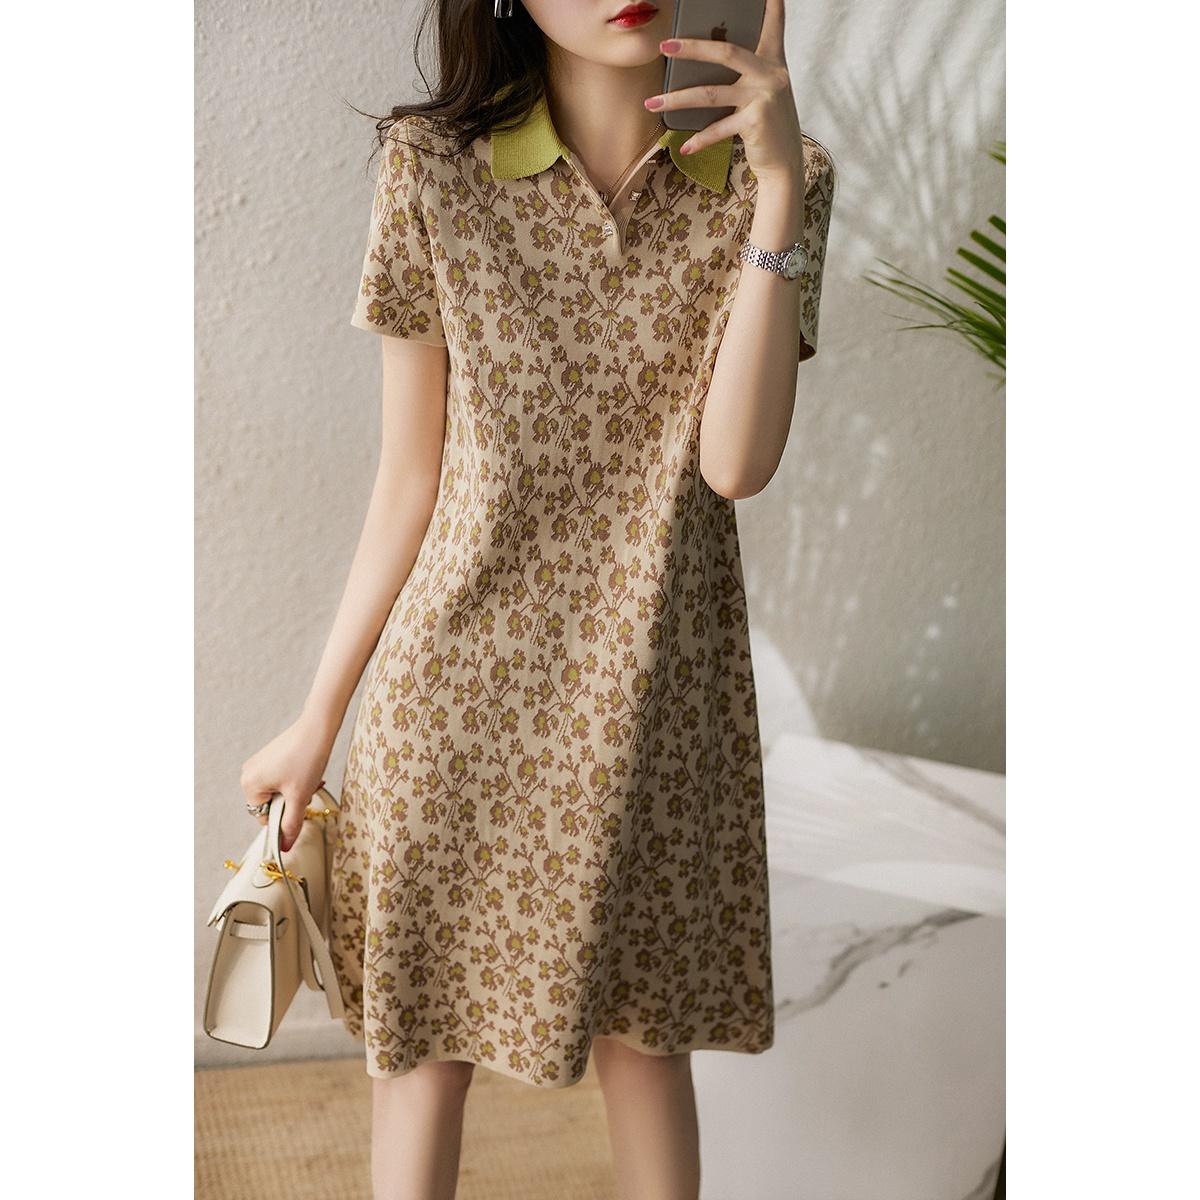 Short sleeve thin color skirt womens 2021 summer floral temperament Lapel knitted acetate cotton medium length dress